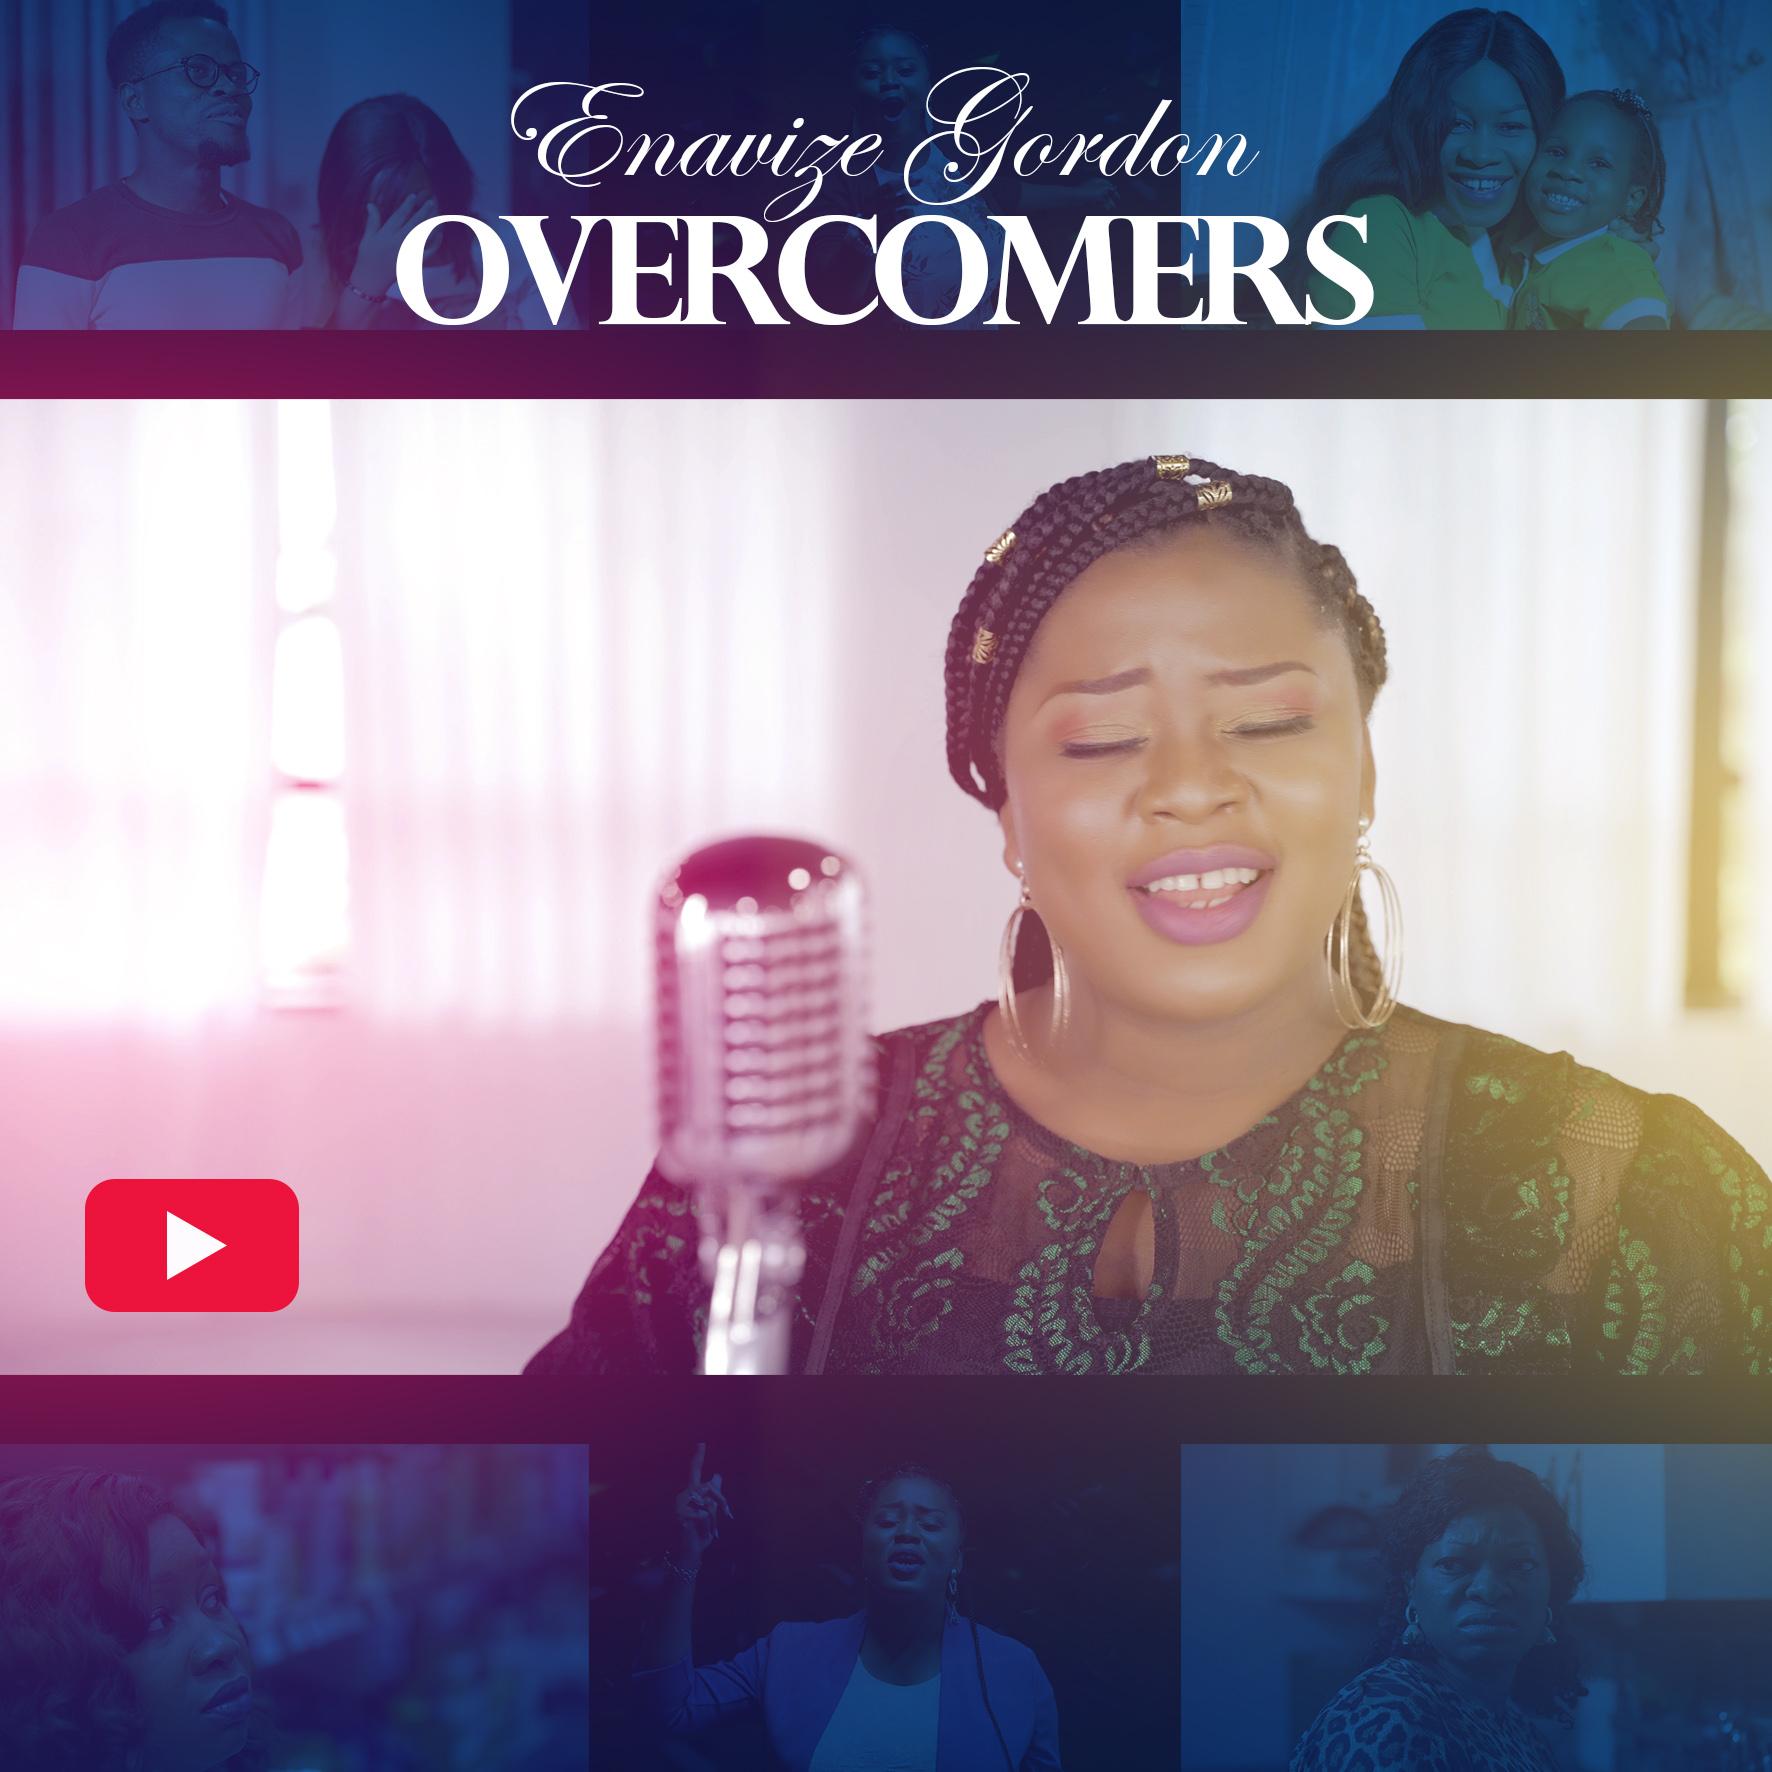 Download Enavize Gordon Overcomers mp3